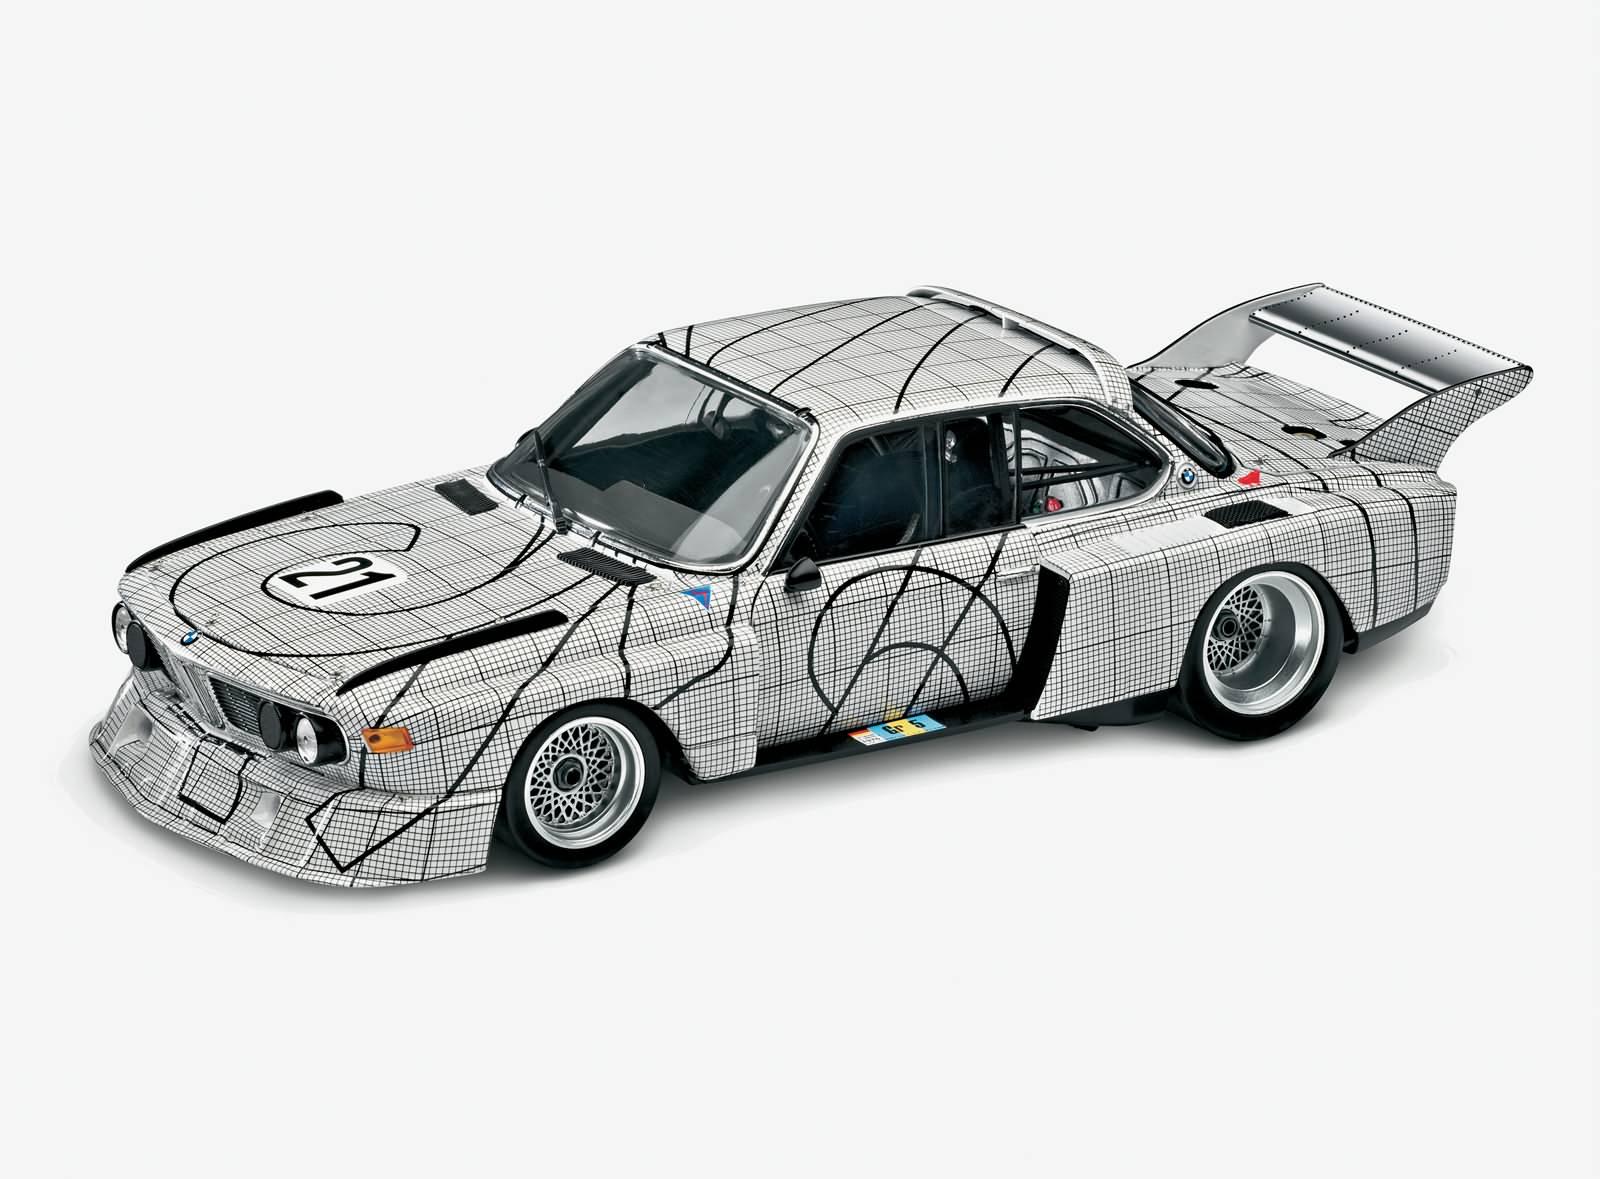 Frank Stella's - BMW 3.0 CSL